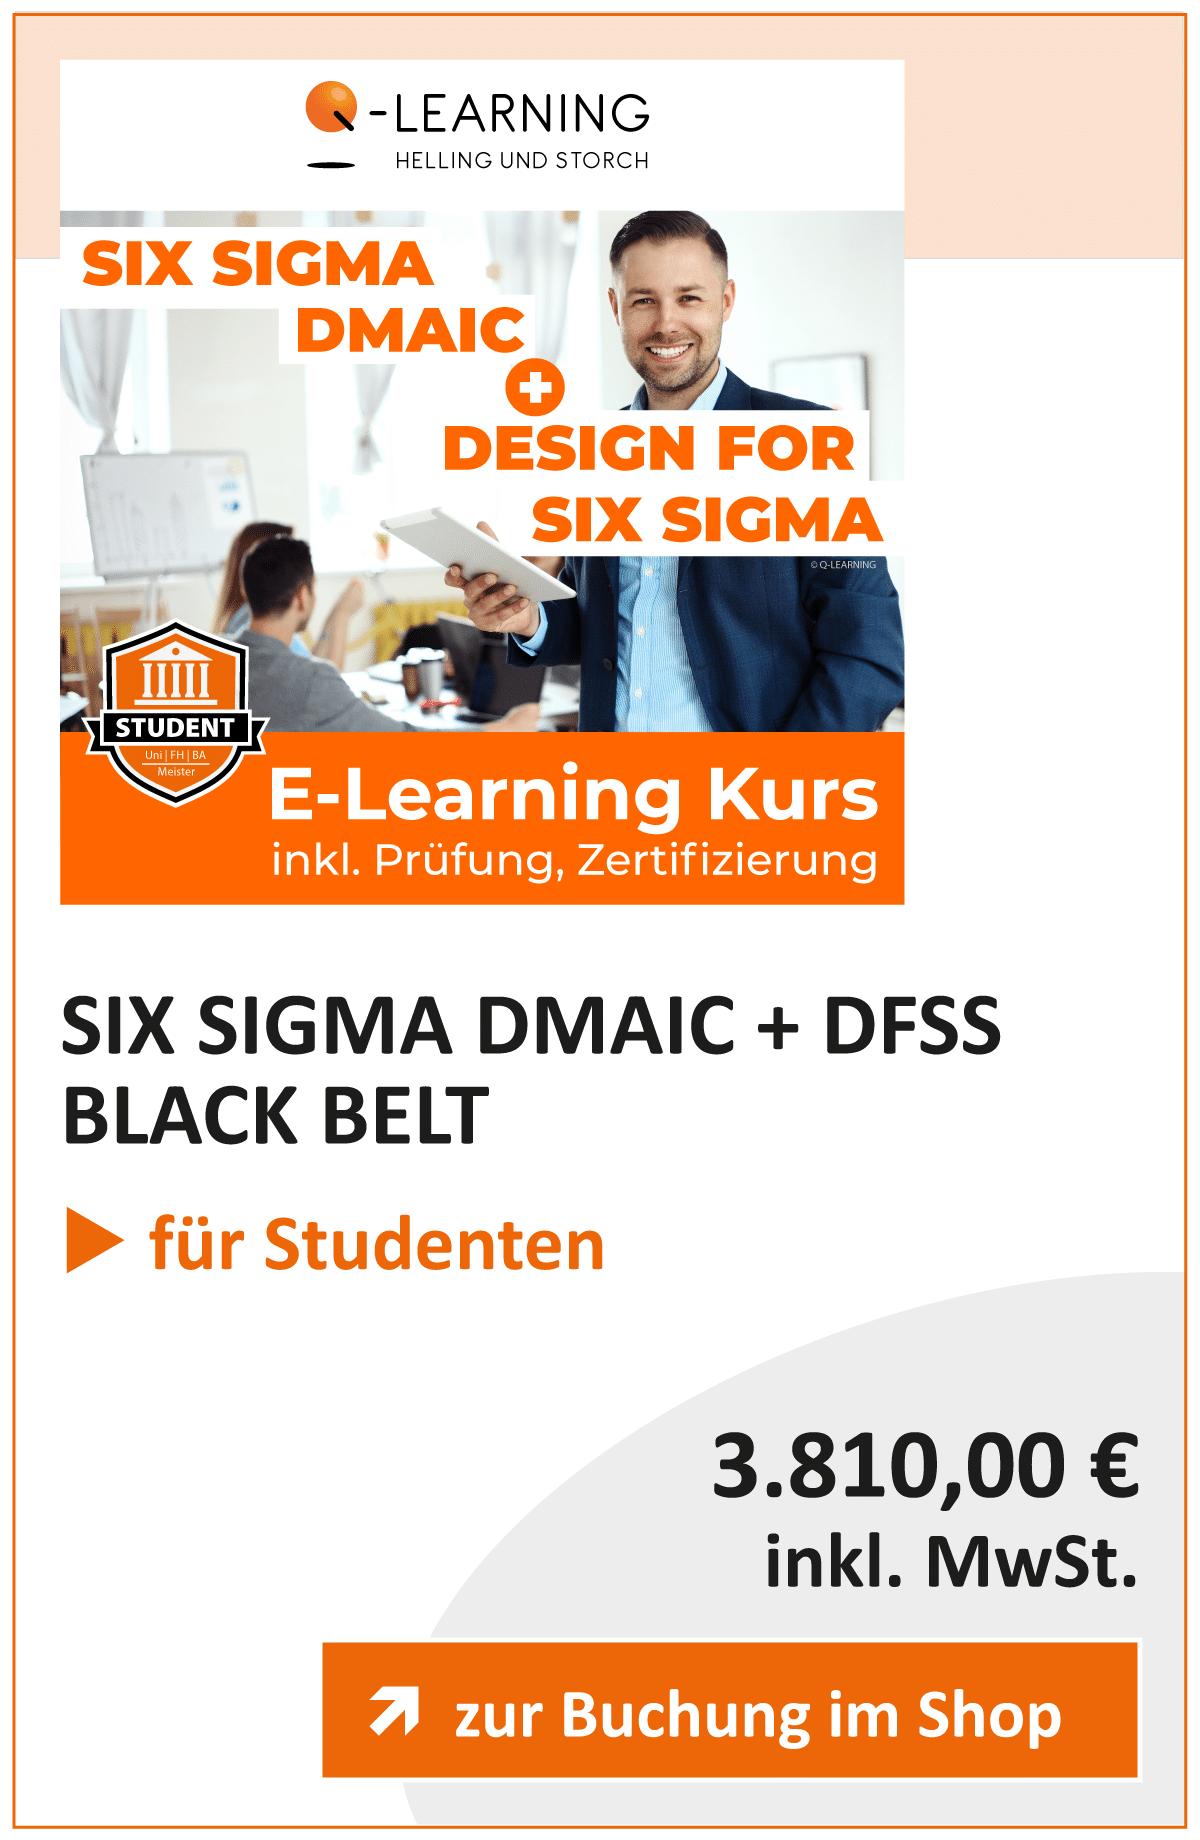 Produktbox SIX SIGMA DMAIC DESIGN FOR SIX SIGMA Studenten